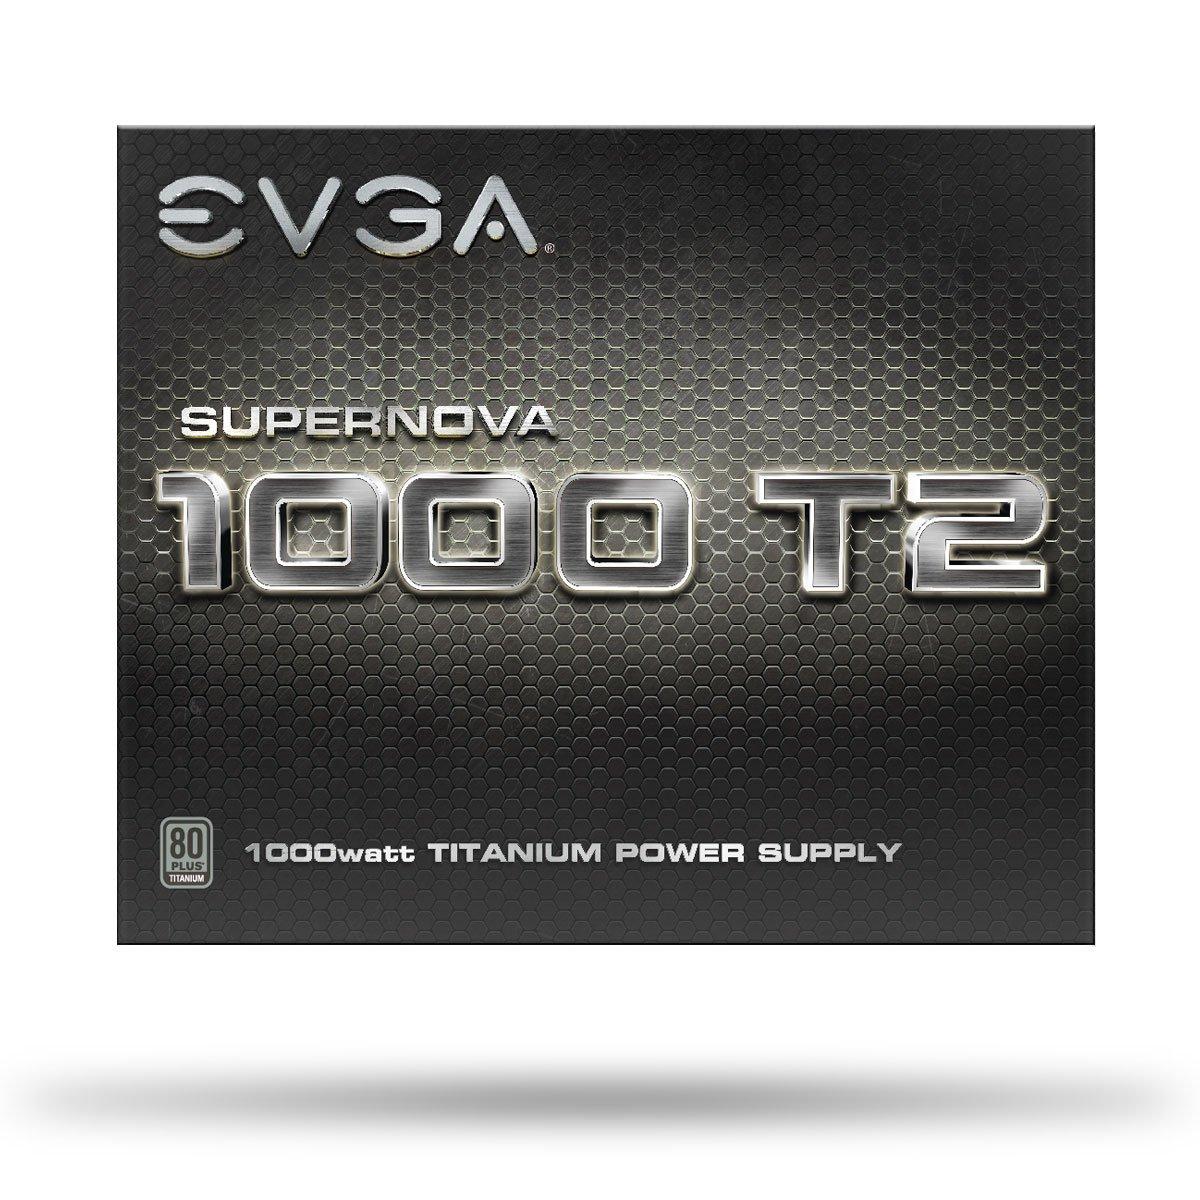 EVGA SuperNOVA 1000 T2, 80+ TITANIUM 1000W, Fully Modular, EVGA ECO Mode, 10 Year Warranty , Includes FREE Power On Self Tester, Power Supply 220-T2-1000-X1 by EVGA (Image #8)